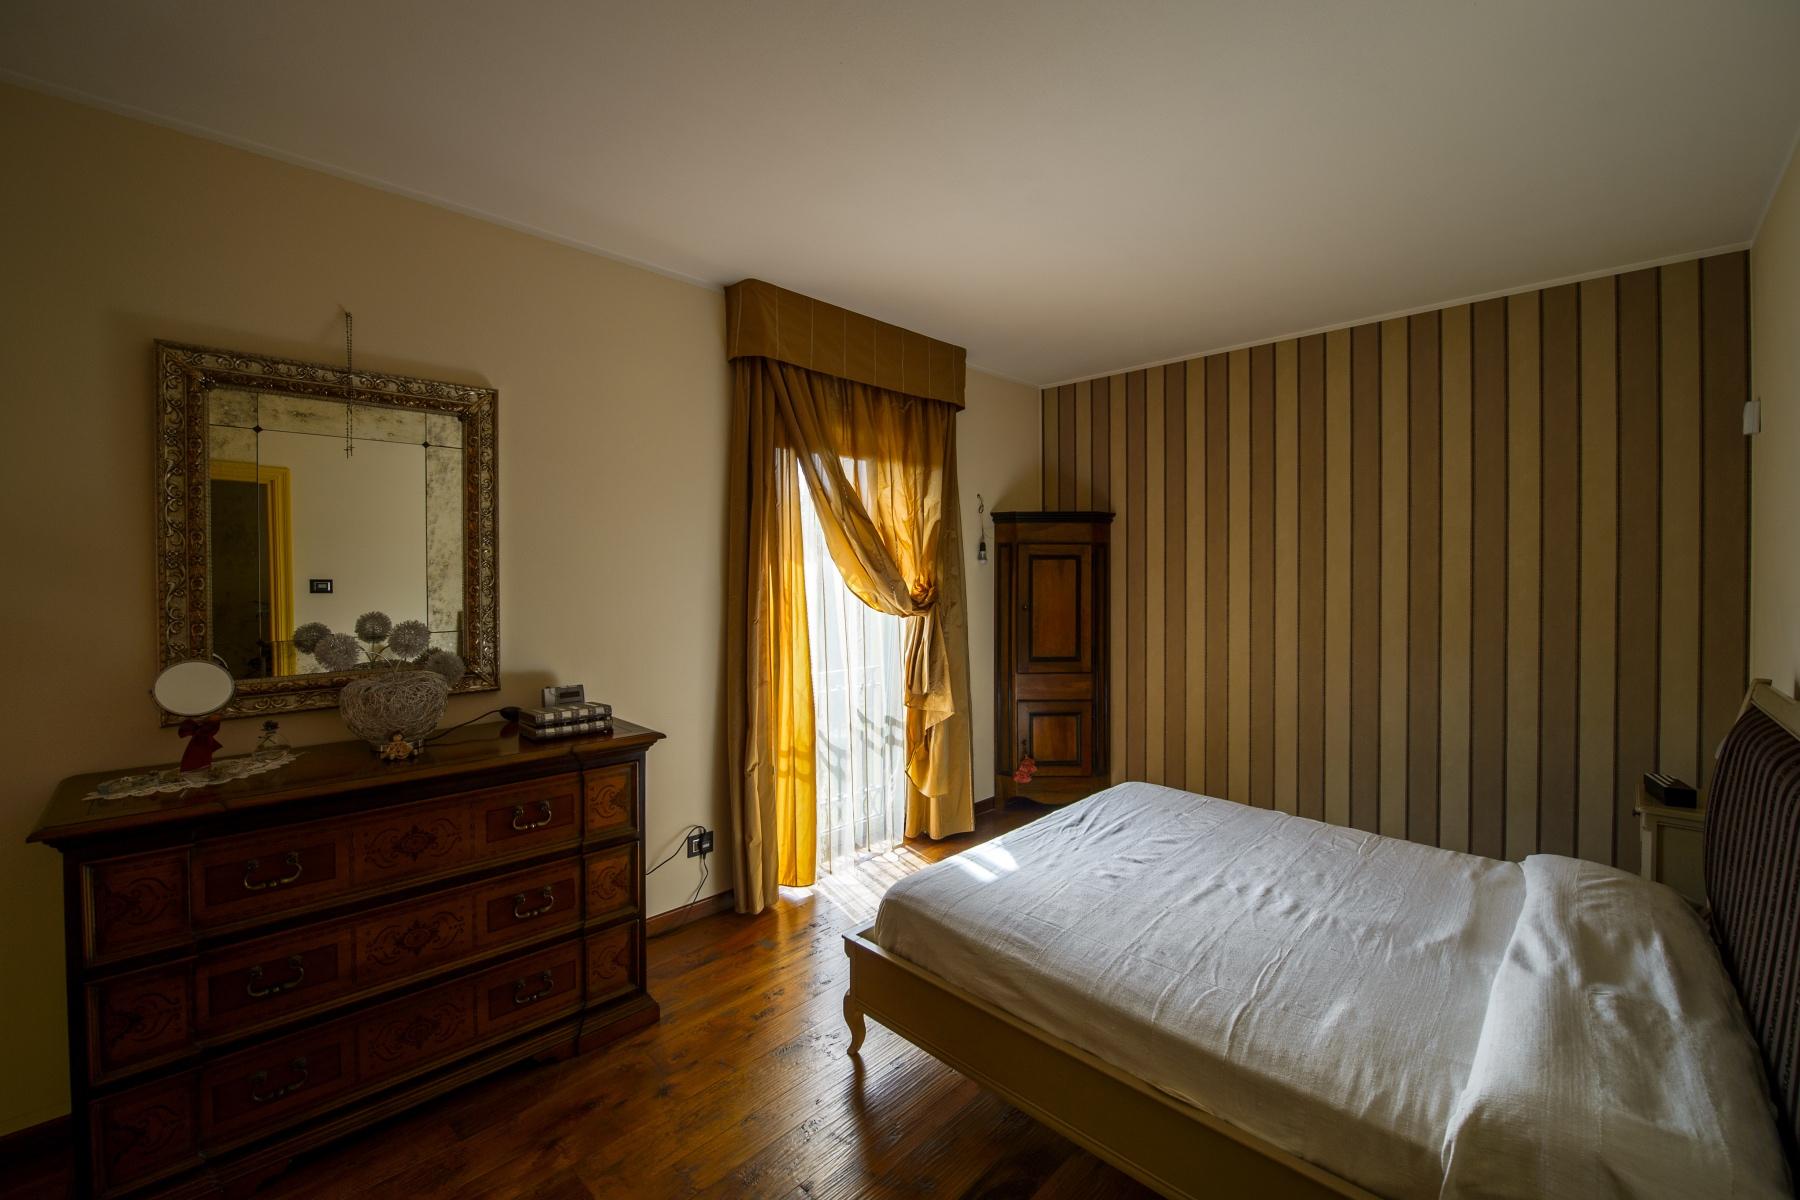 Casa indipendente in Vendita a Agrate Conturbia: 5 locali, 400 mq - Foto 15